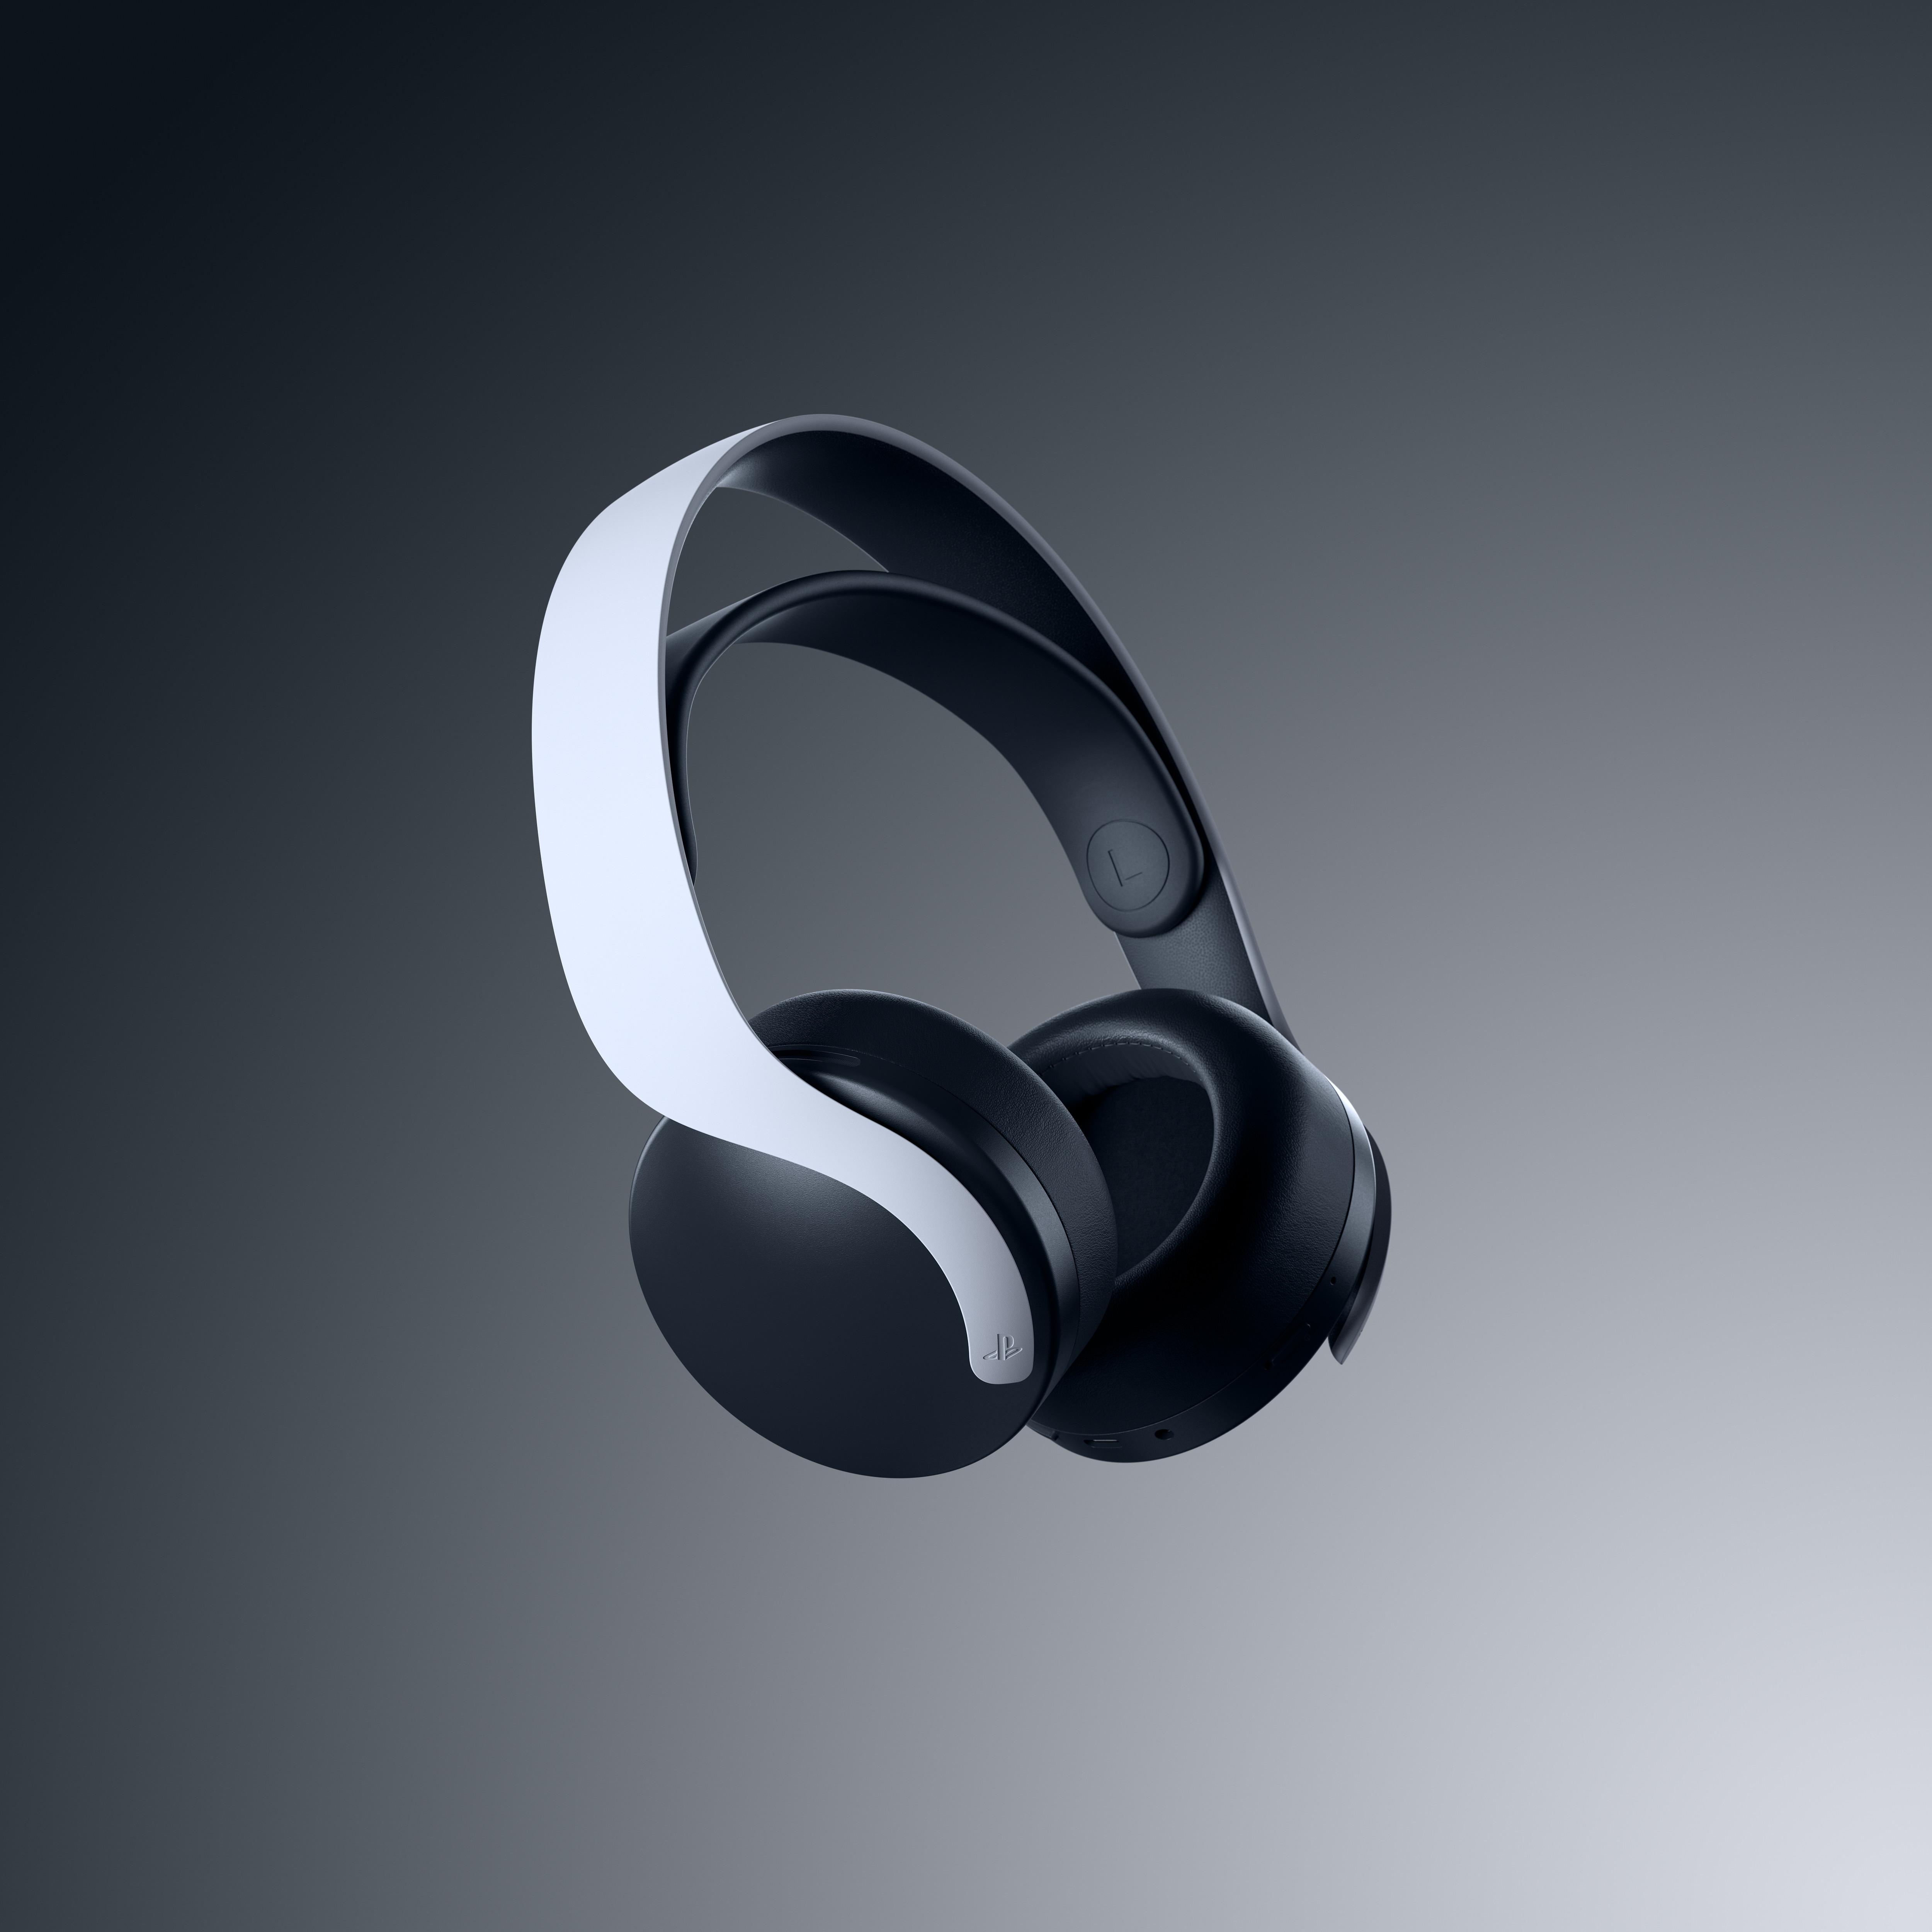 PlayStation 5 - Pulse 3D wireless headset